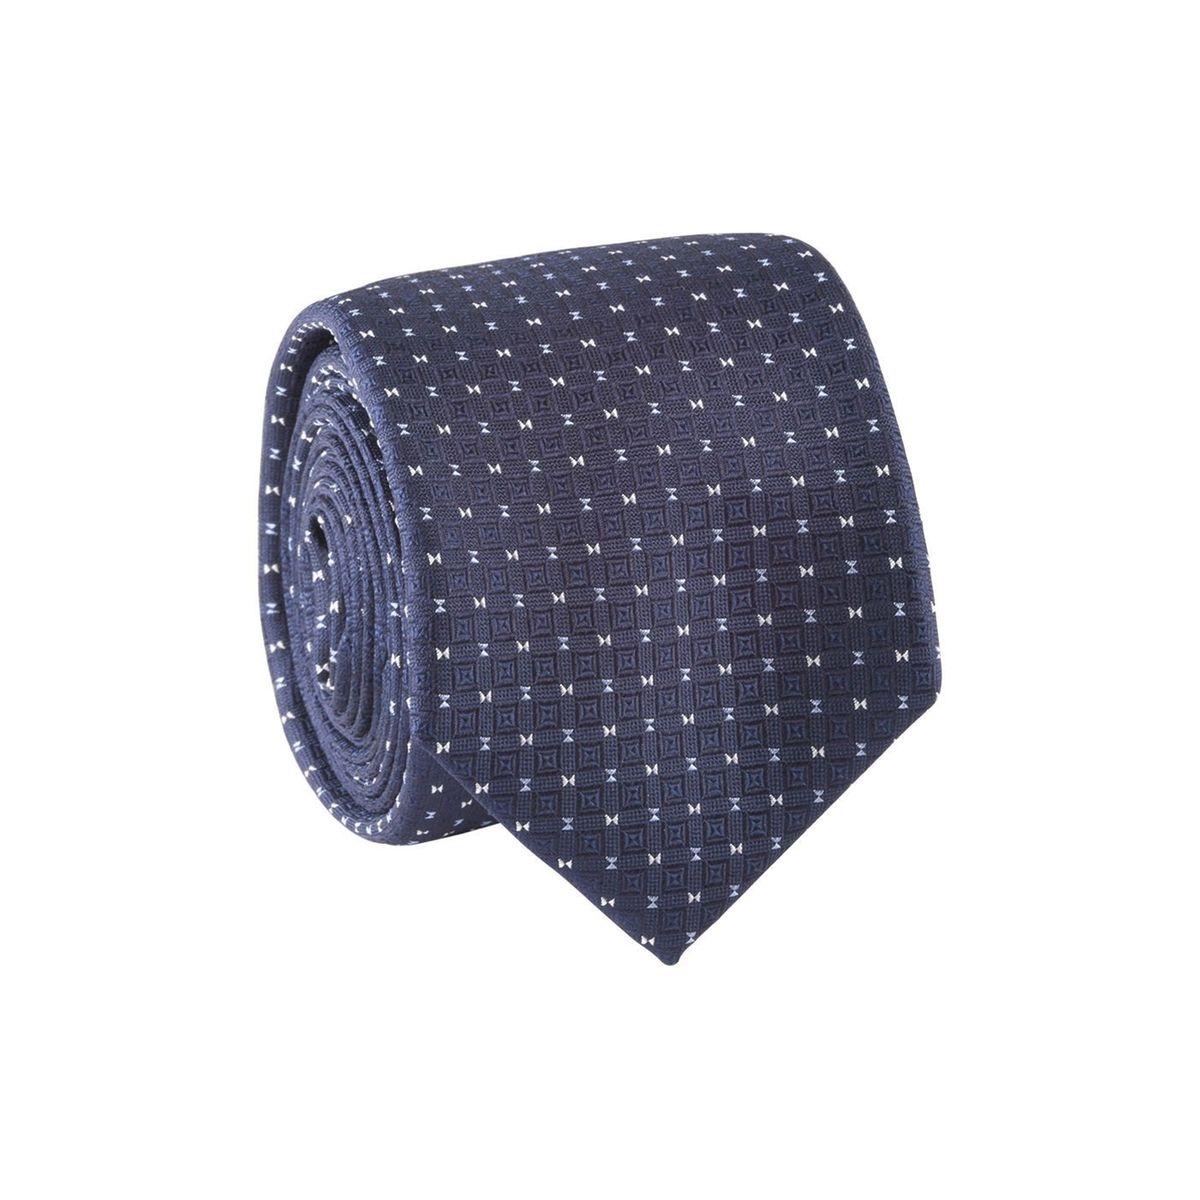 Cravate homme motif sablier Bleu marine / Bleu ciel